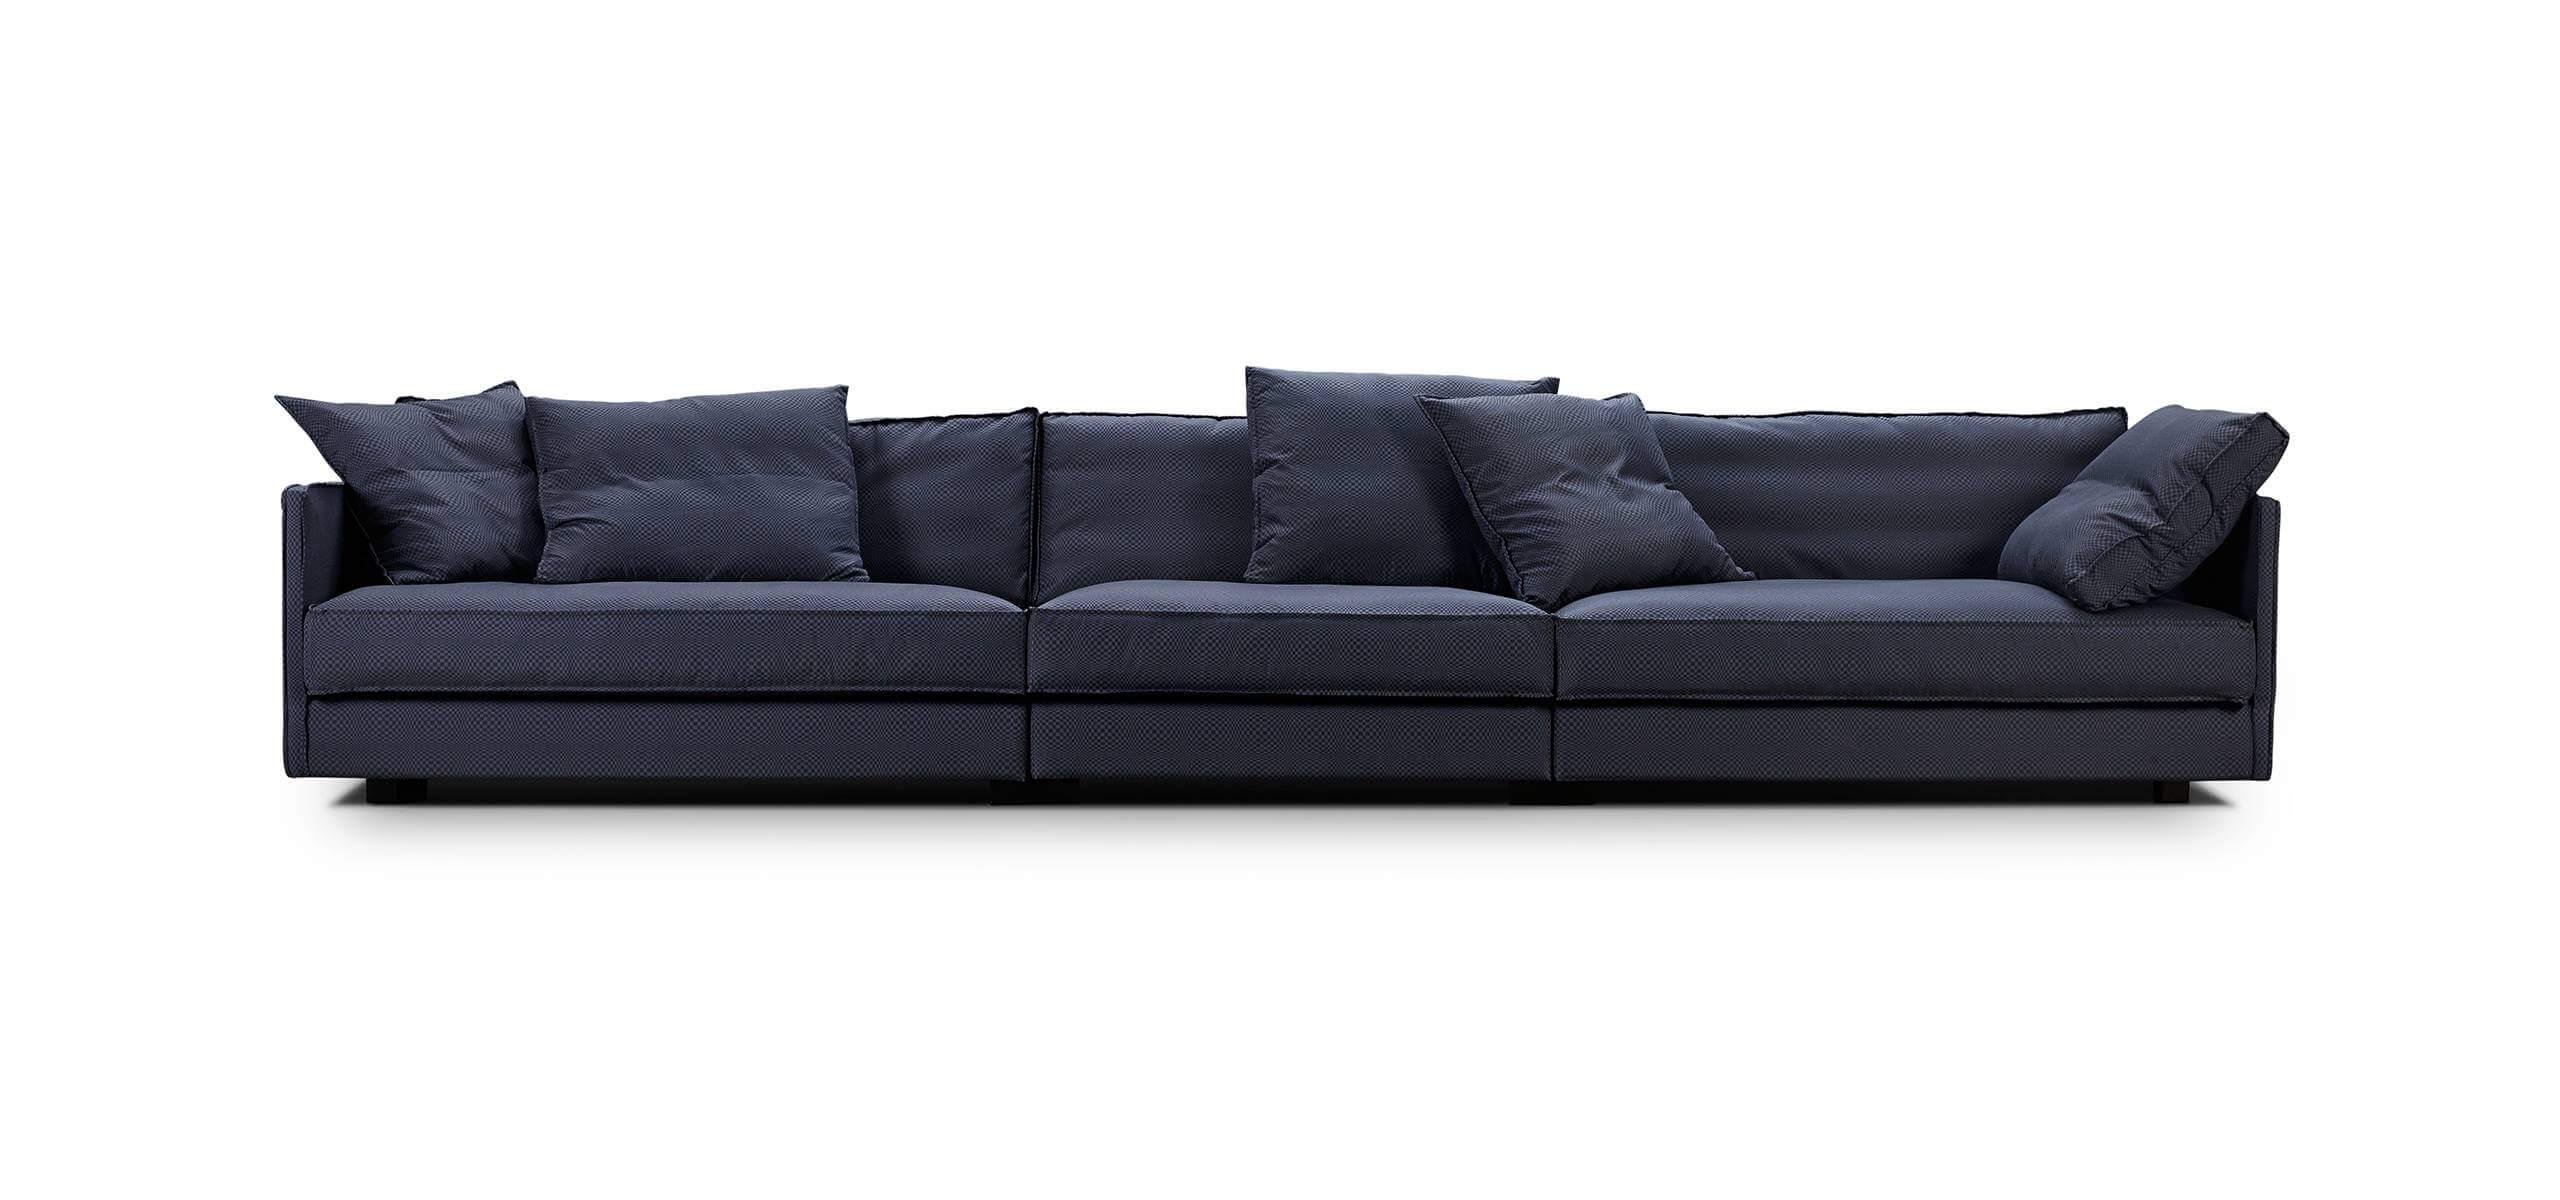 eilersen sofa Eilersen   Flap eilersen sofa